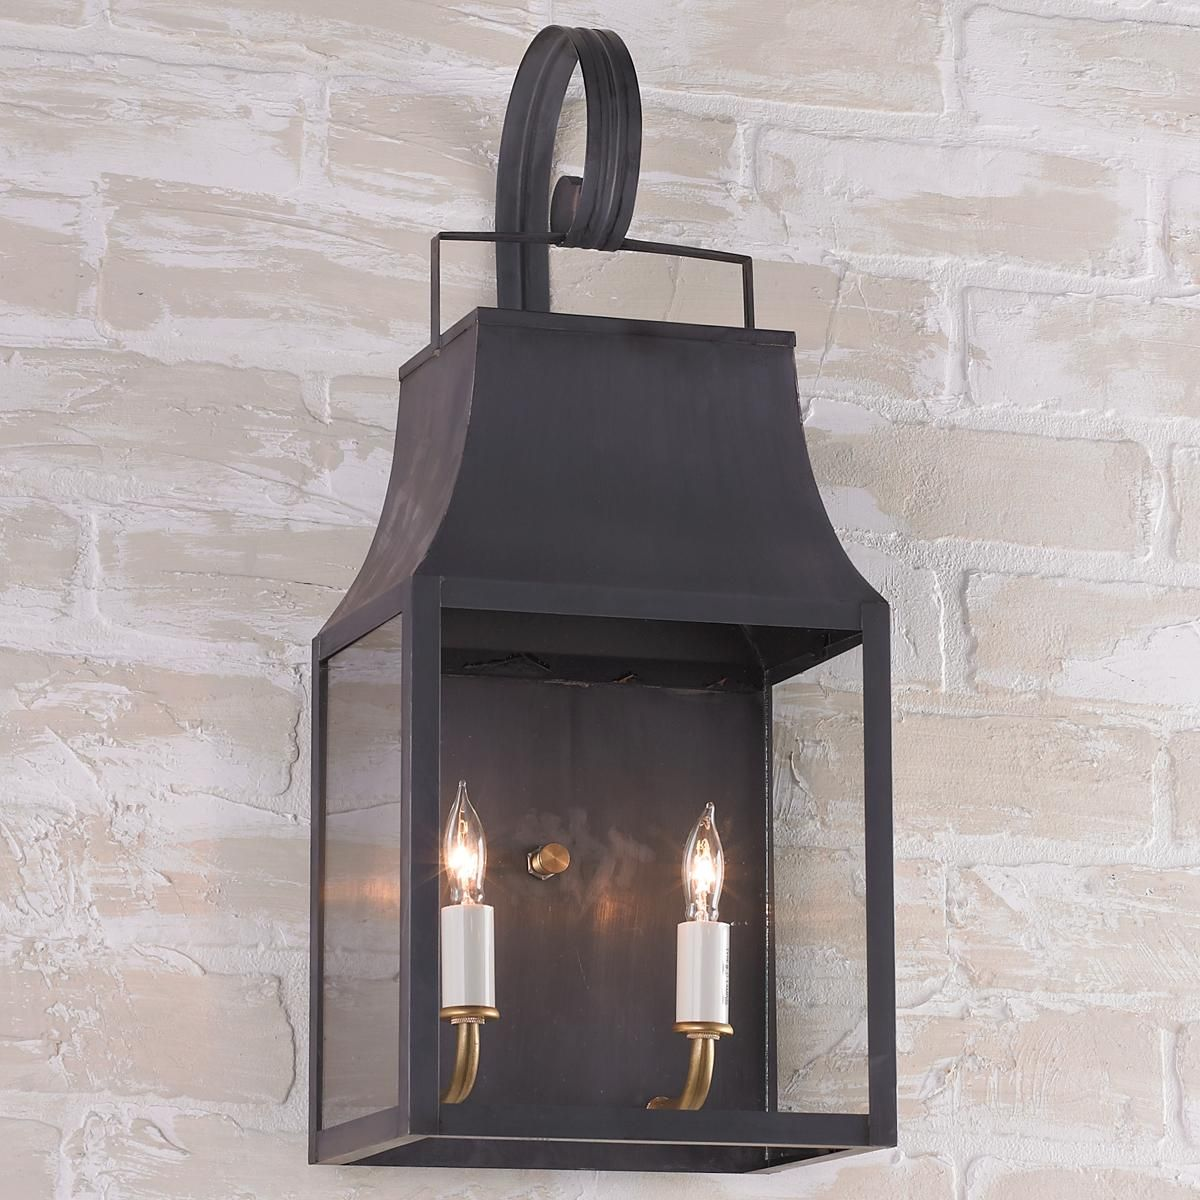 Anselda 15 High Bronze Outdoor Wall Light 6y484 Lamps Plus Outdoor Wall Lighting Wall Lights Outdoor Walls